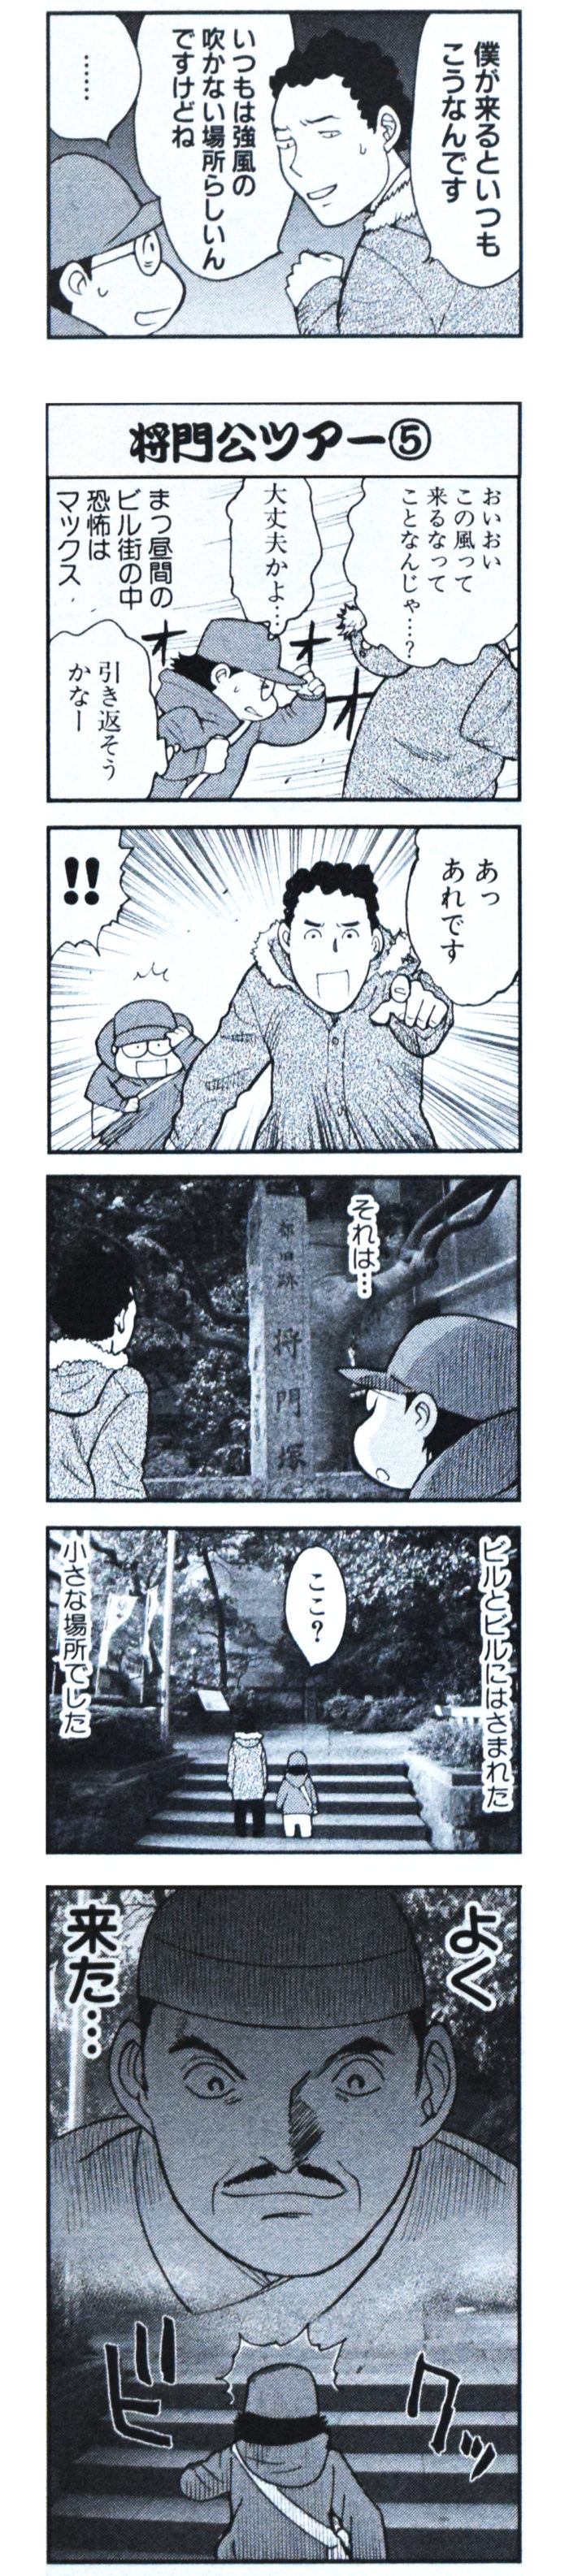 torihada-syoumon2-02